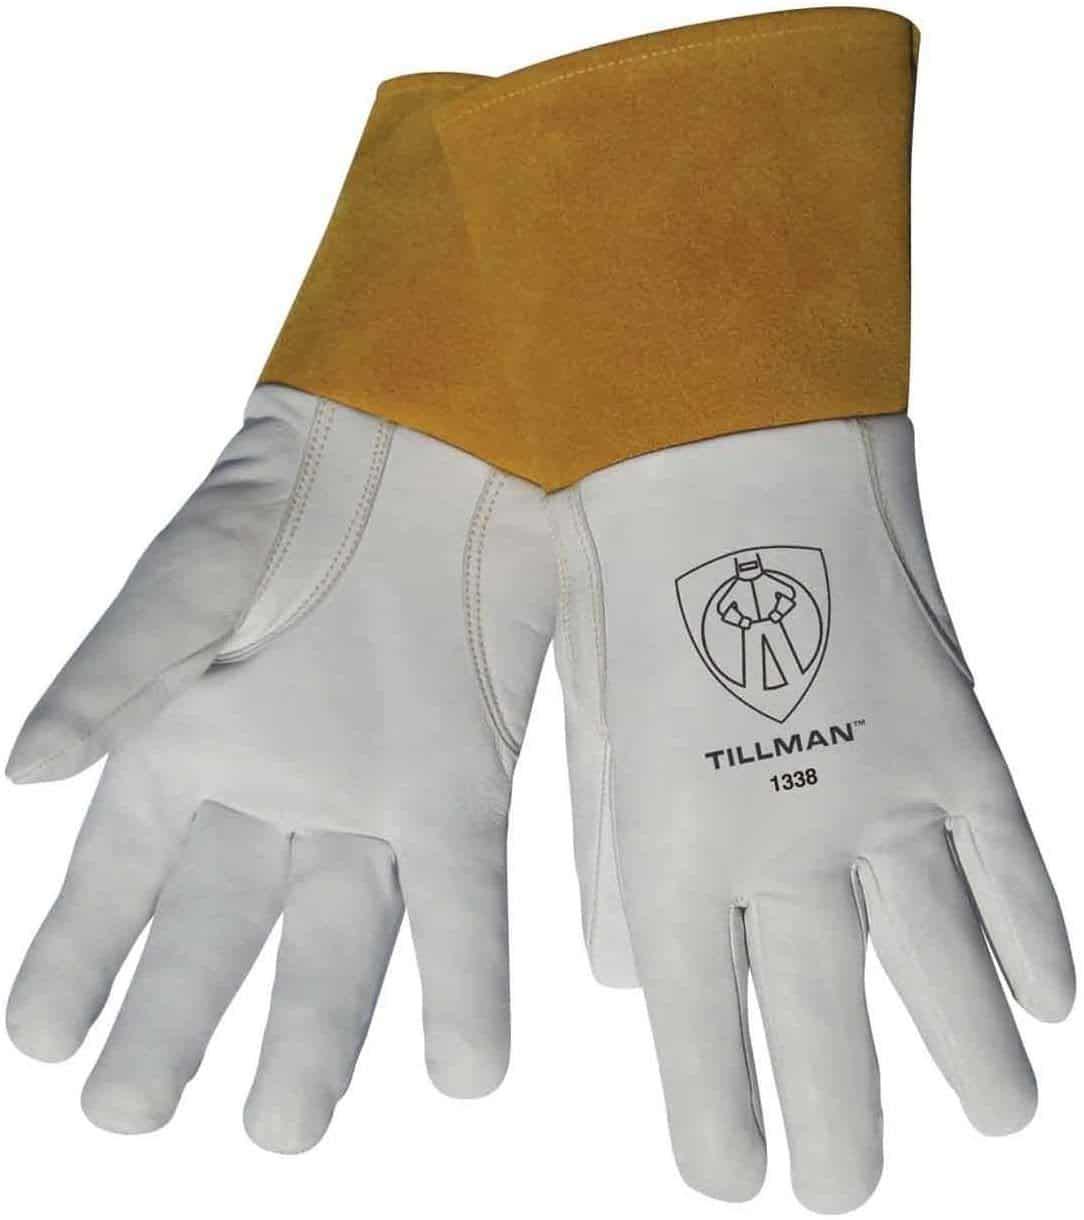 Tillman TIG Welding Gloves X-Large